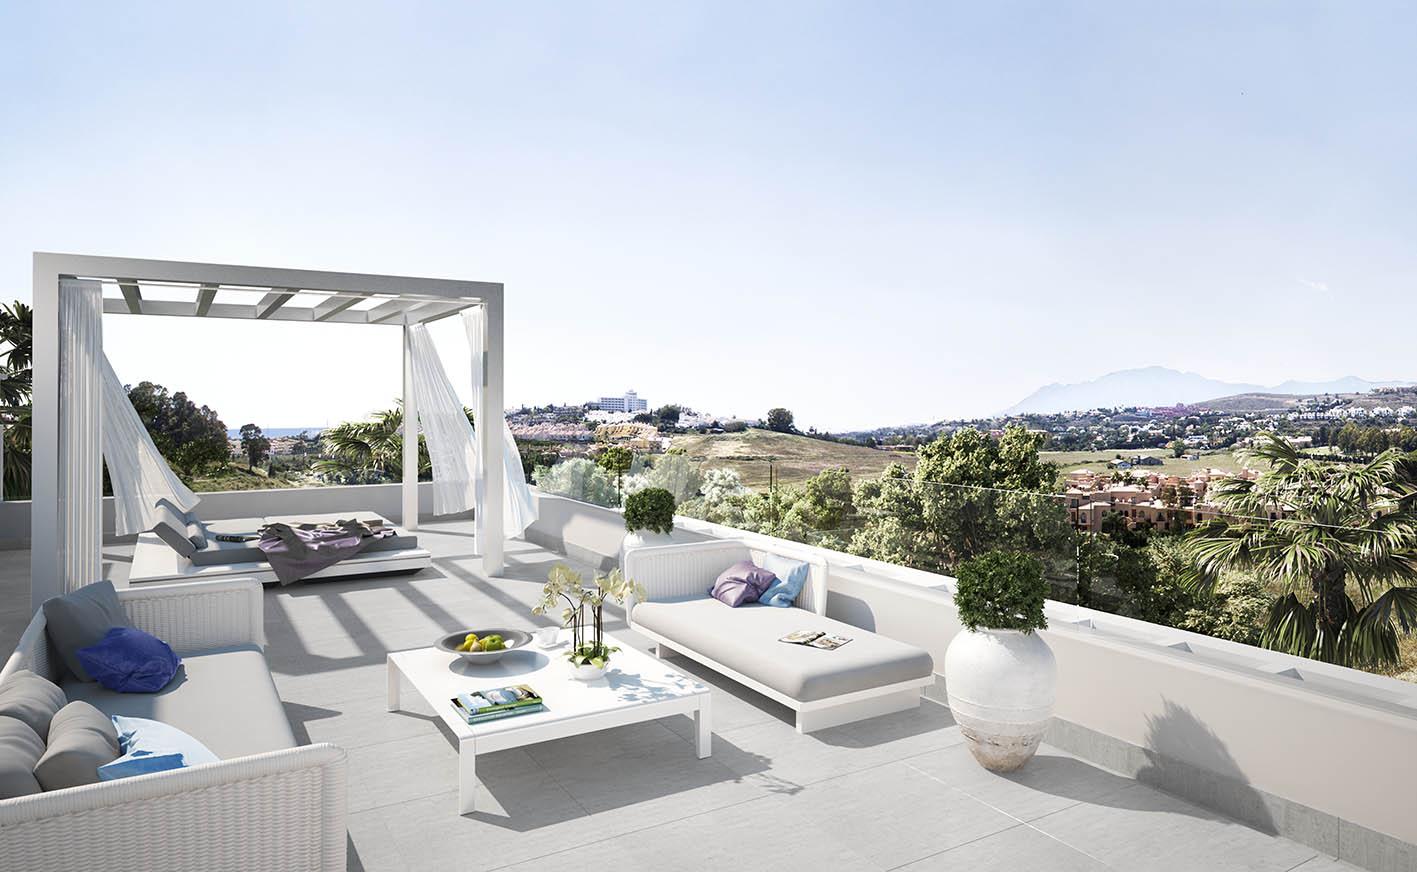 Benahavis Costa del sol.New moderne Entwicklung 40 Luxus ...